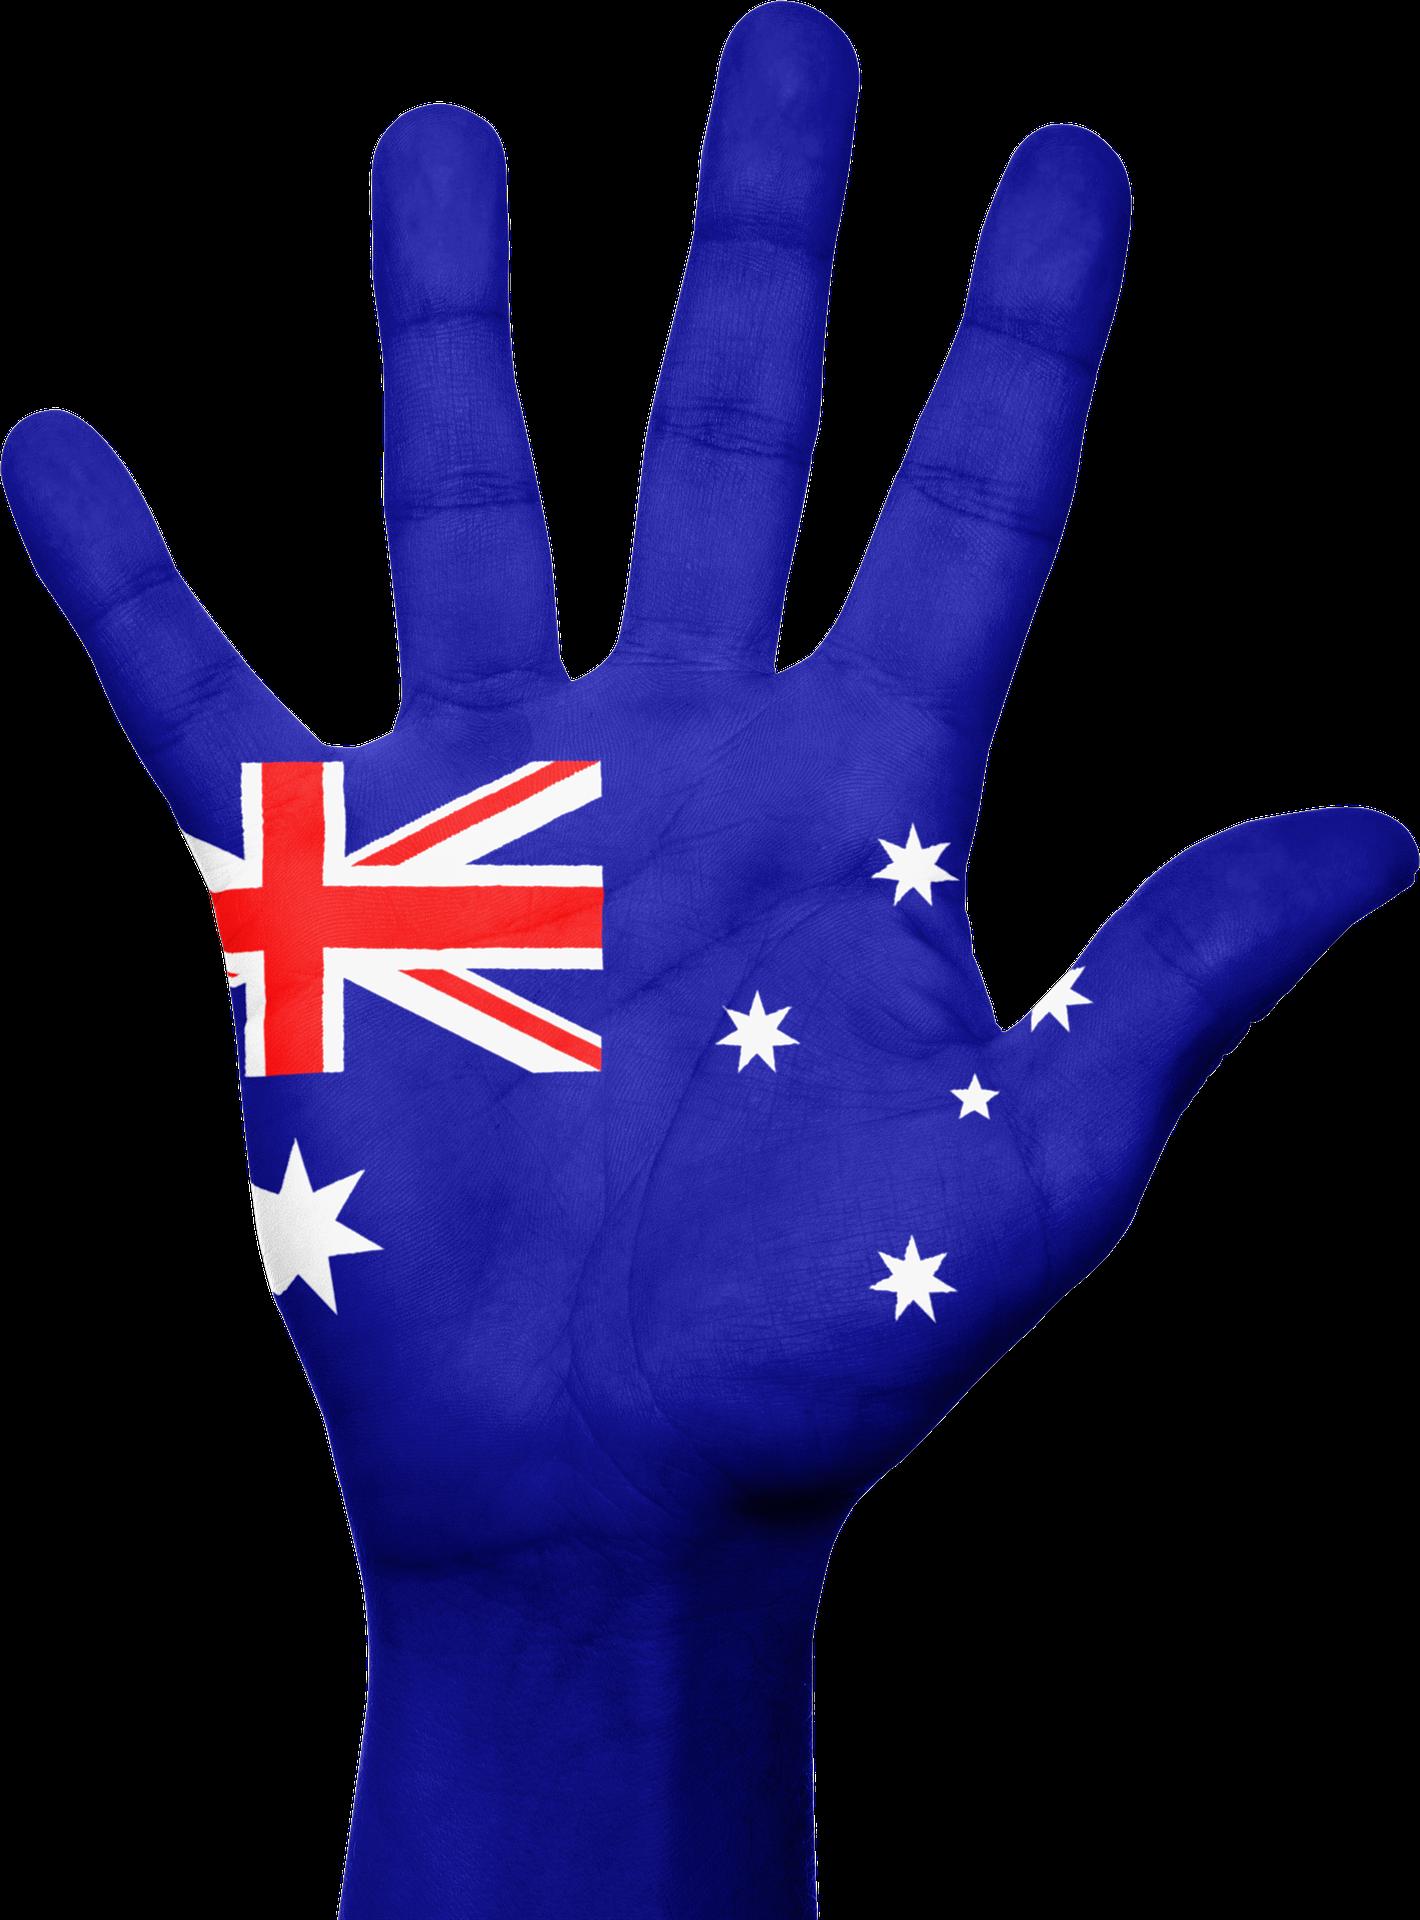 The Harvester judgement and Australia's minimum wage